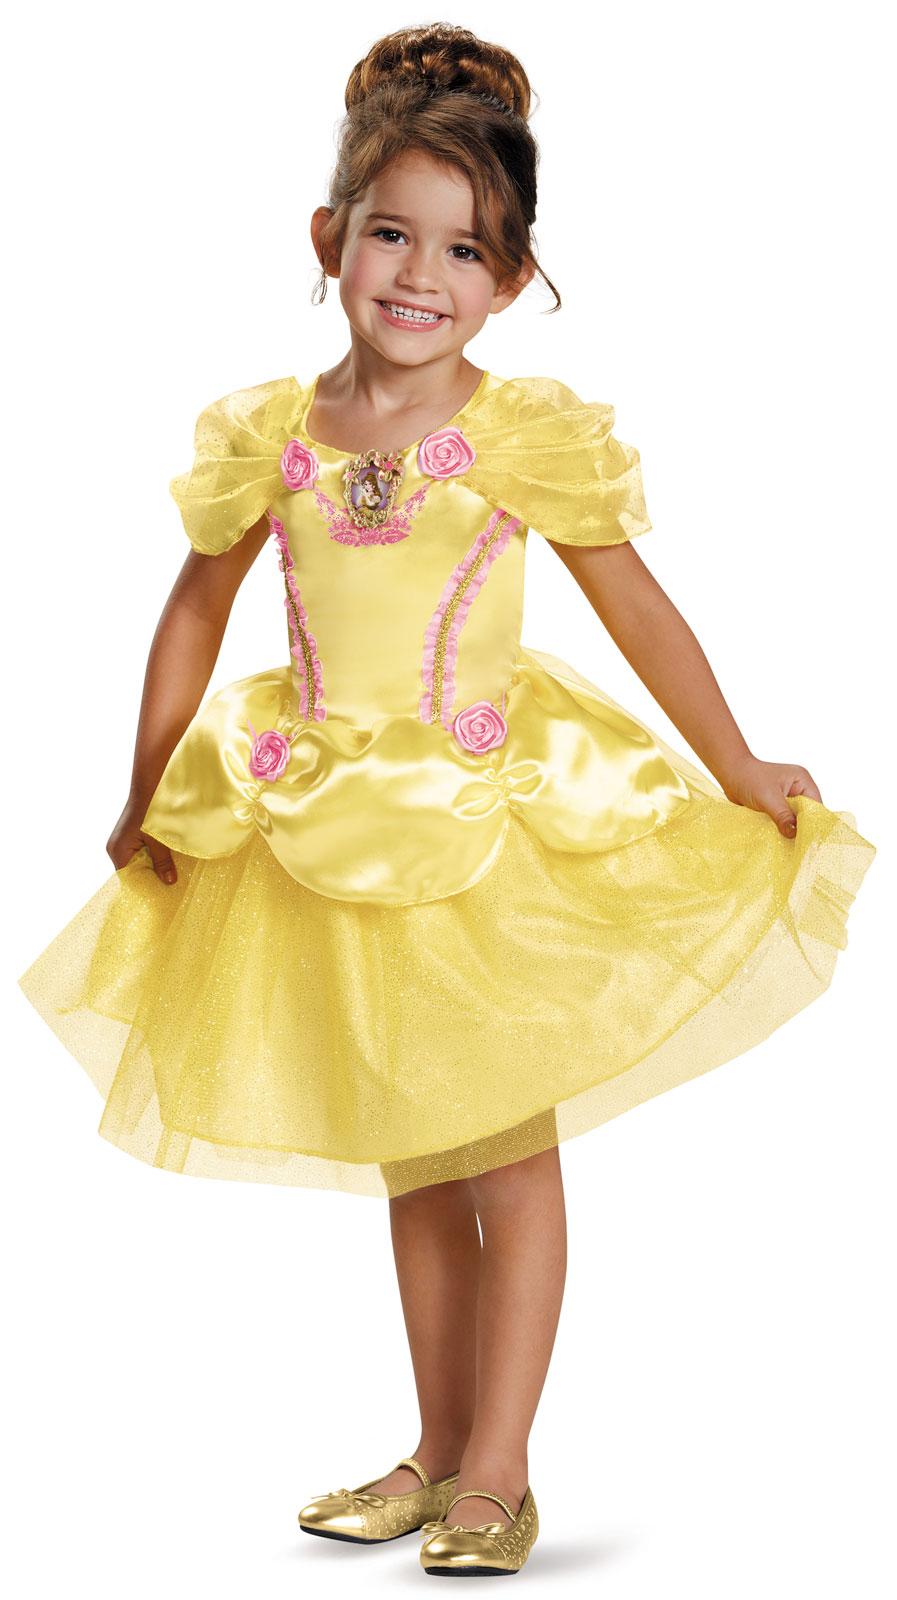 Disney Princess Belle Costume